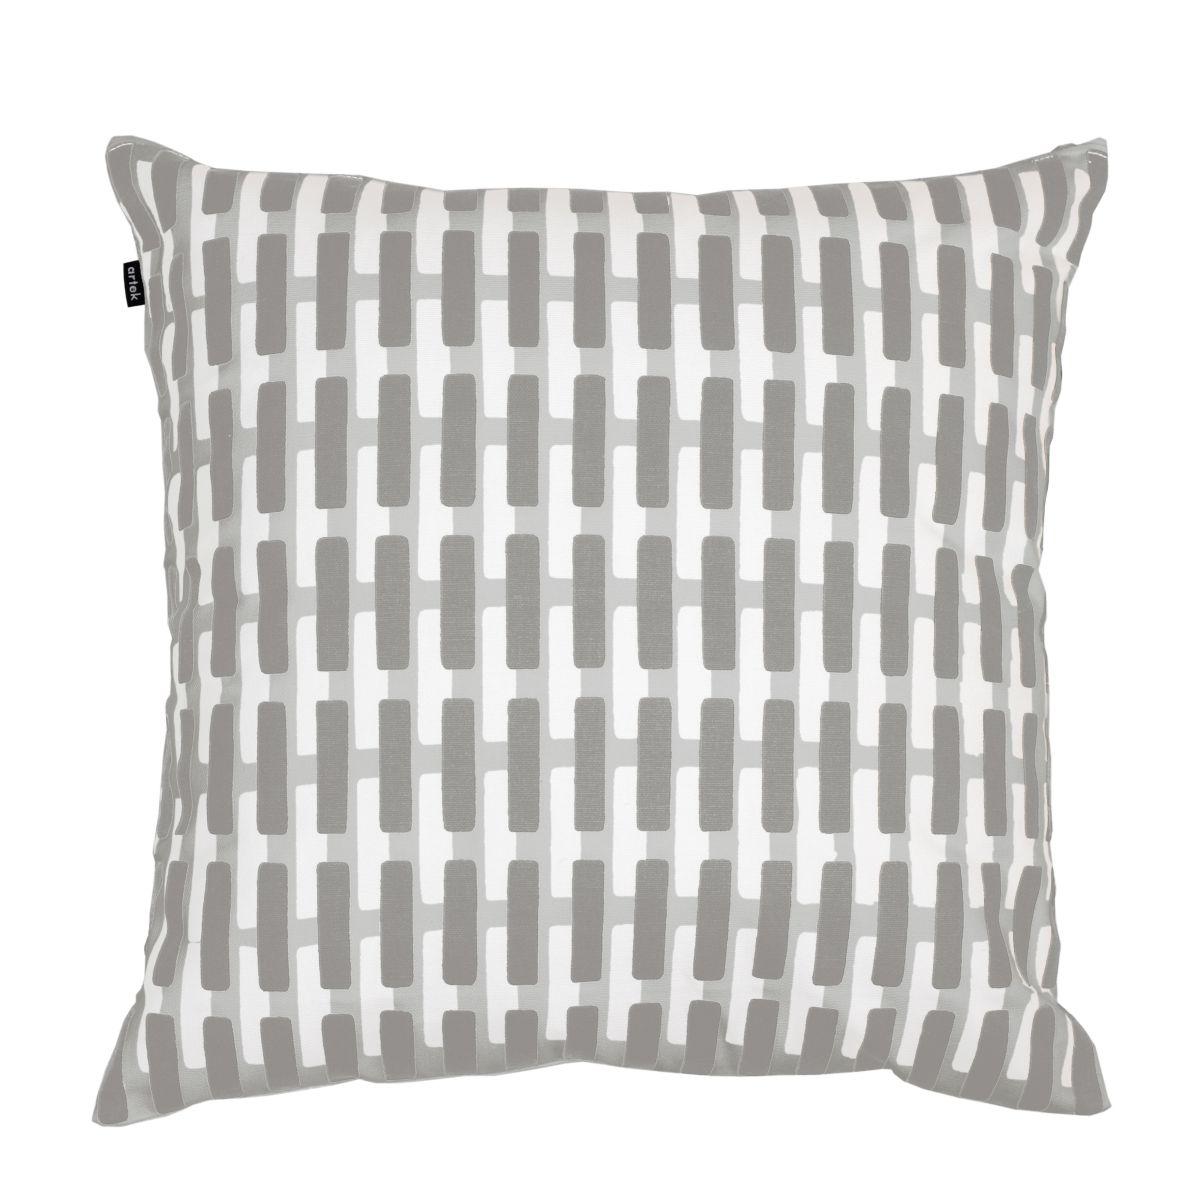 Siena-Cushion-Cover-Cotton-Canvas-large-50-x-50-cm-grey-light-grey-shadow-3976655